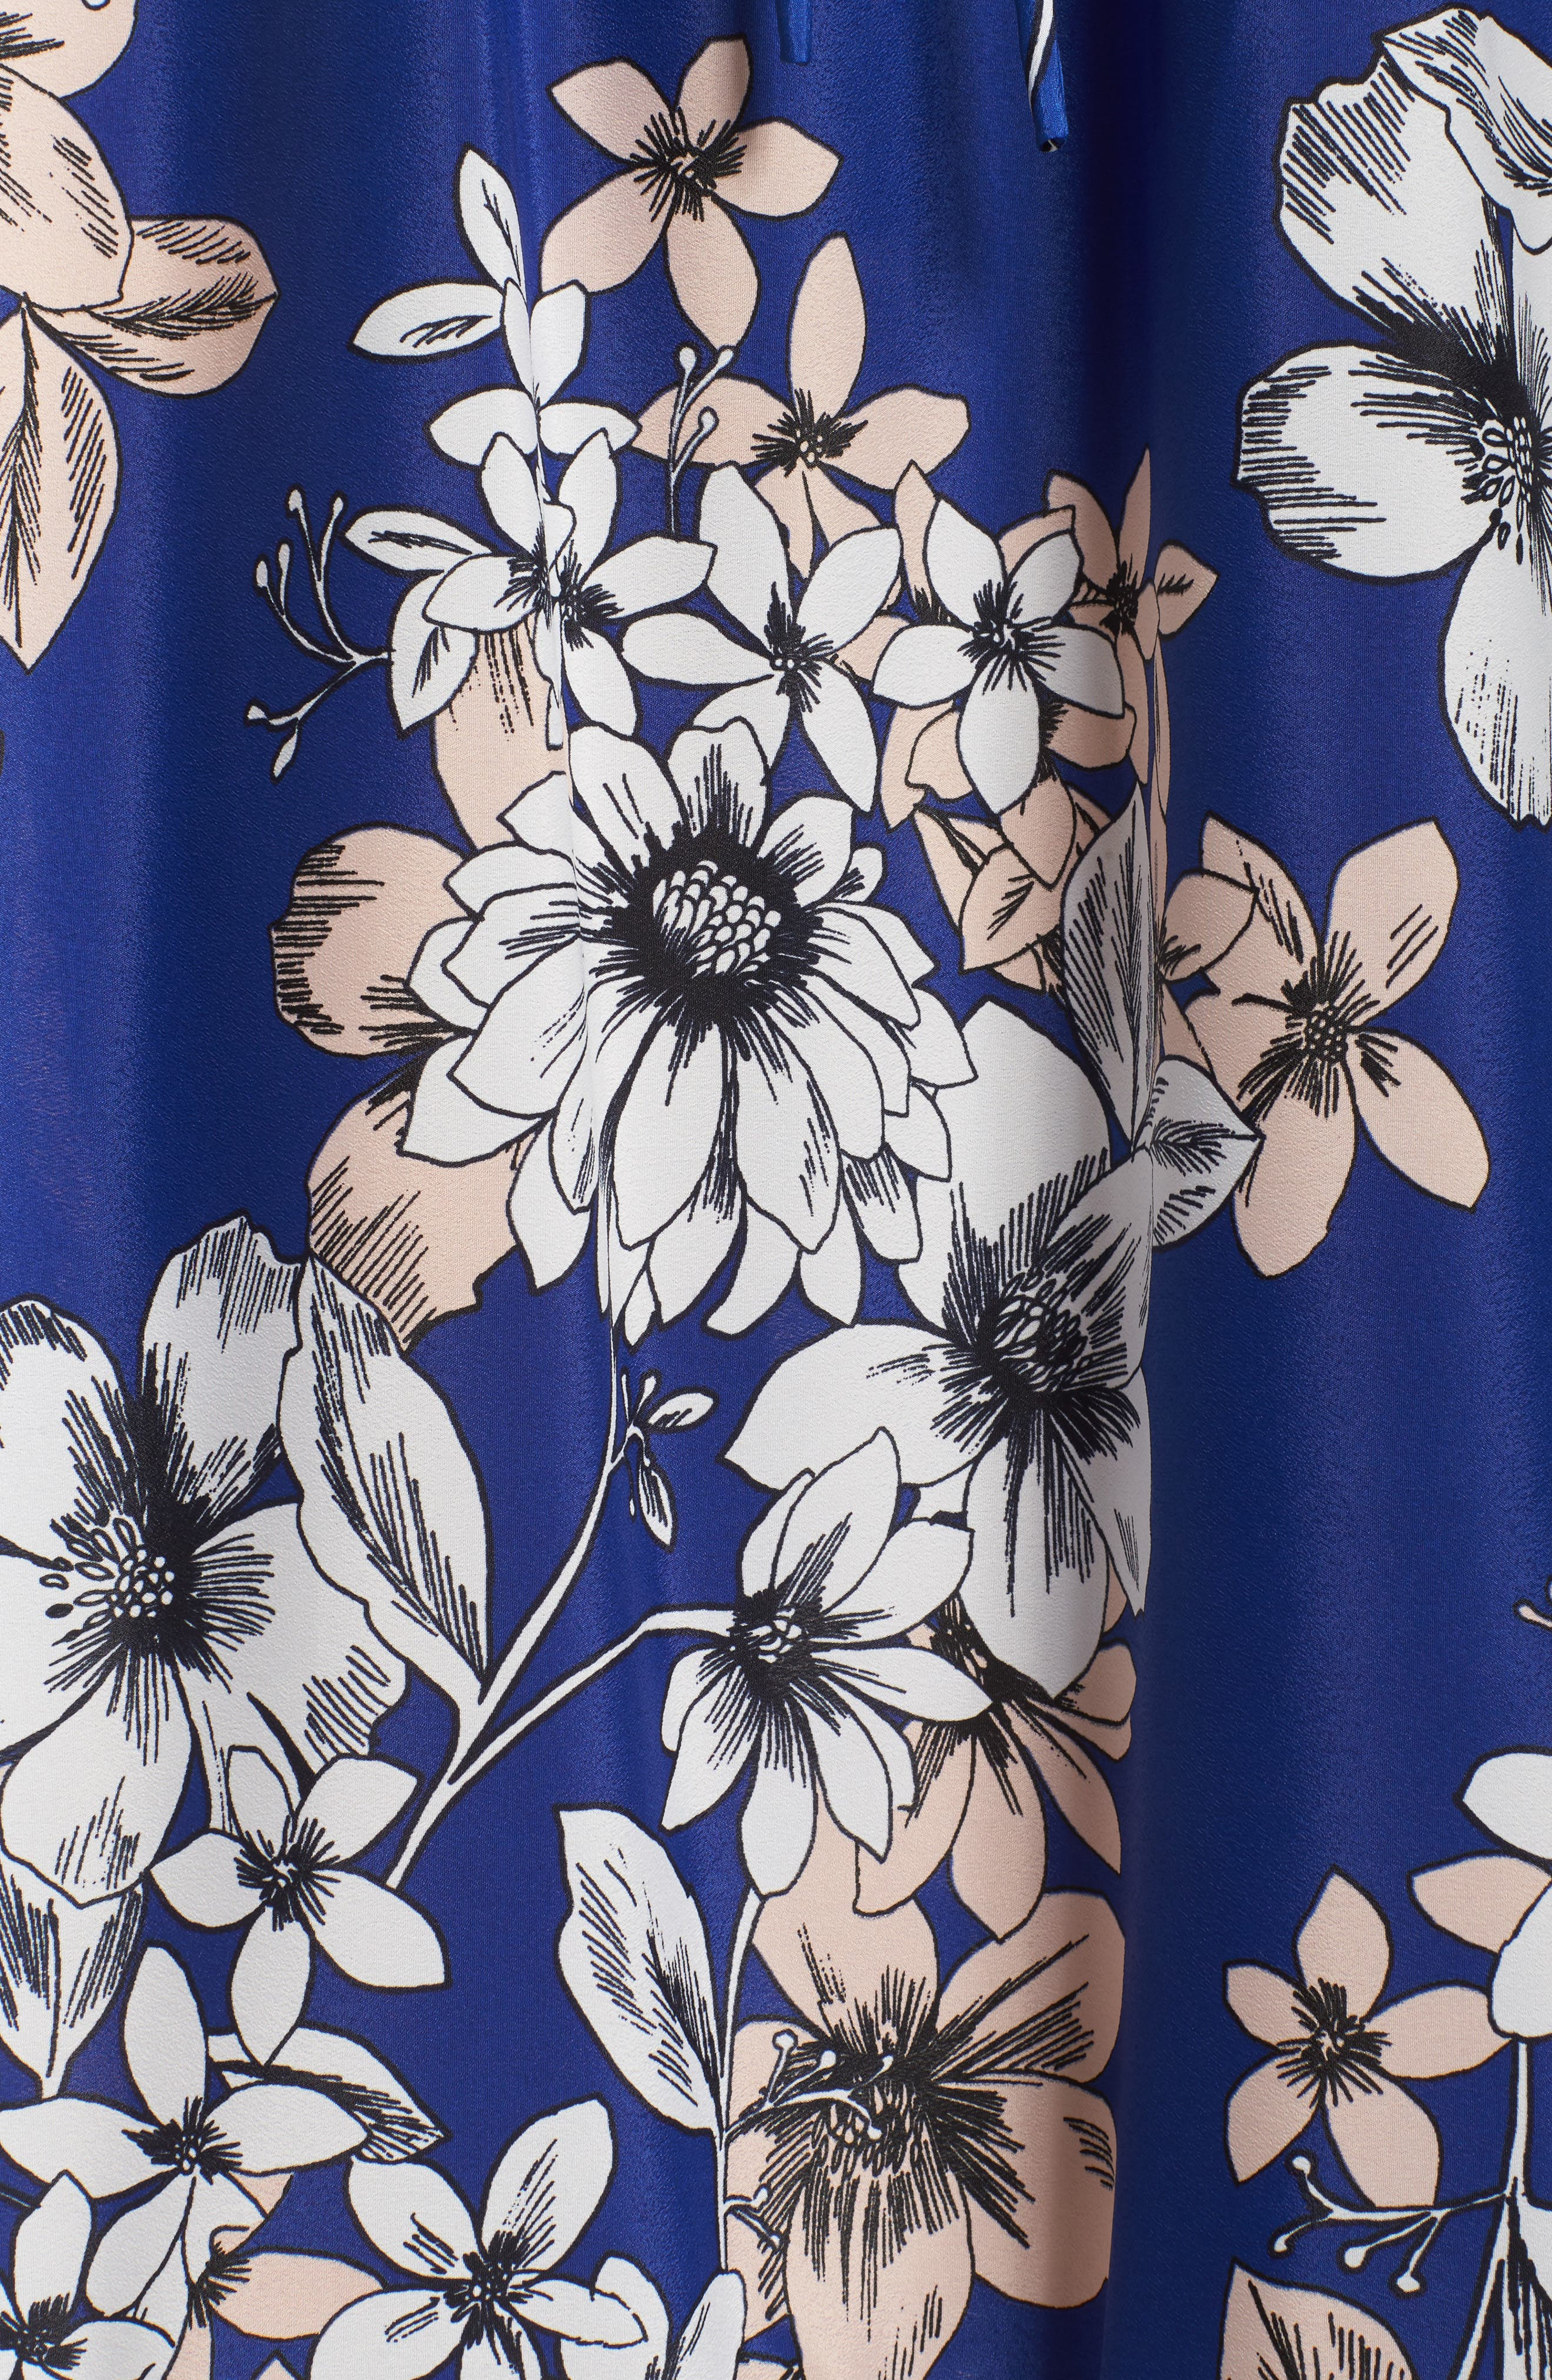 Off the Shoulder Floral Maxi Dress,                             Alternate thumbnail 5, color,                             COBALT